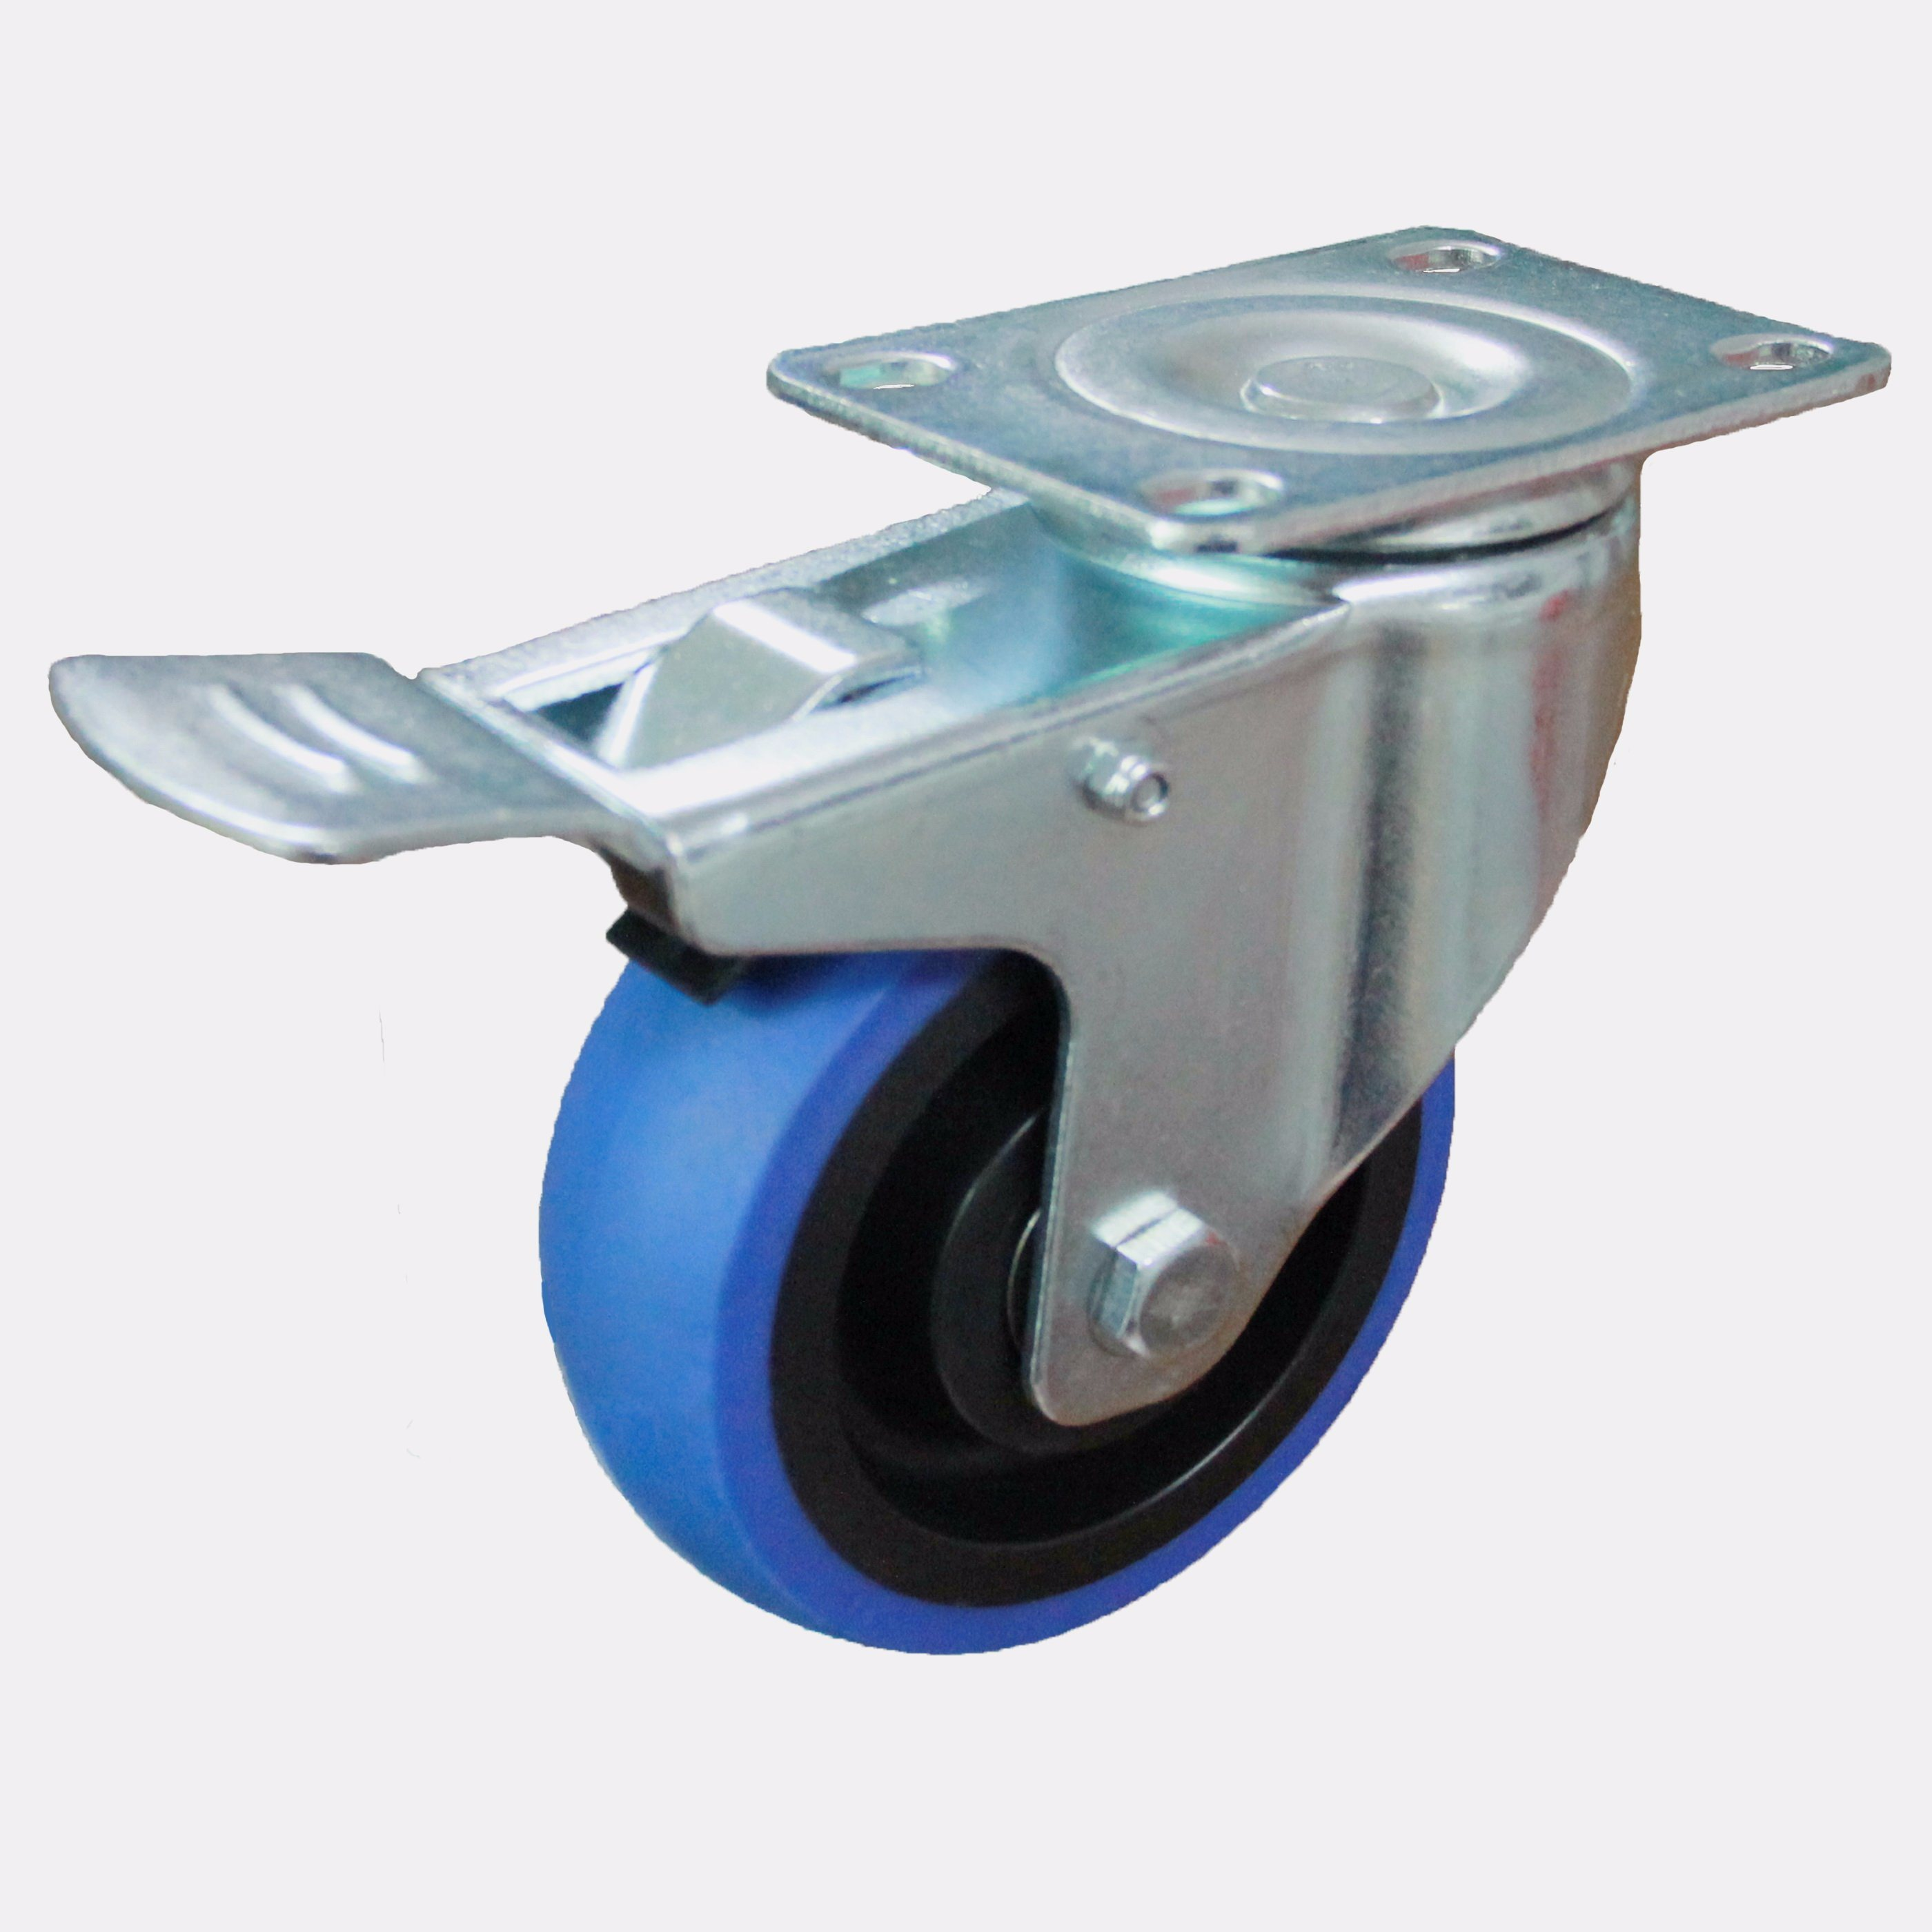 3/4/5 Inch Elastic Rubber Castor Wheels Noiseless Caster with Brake